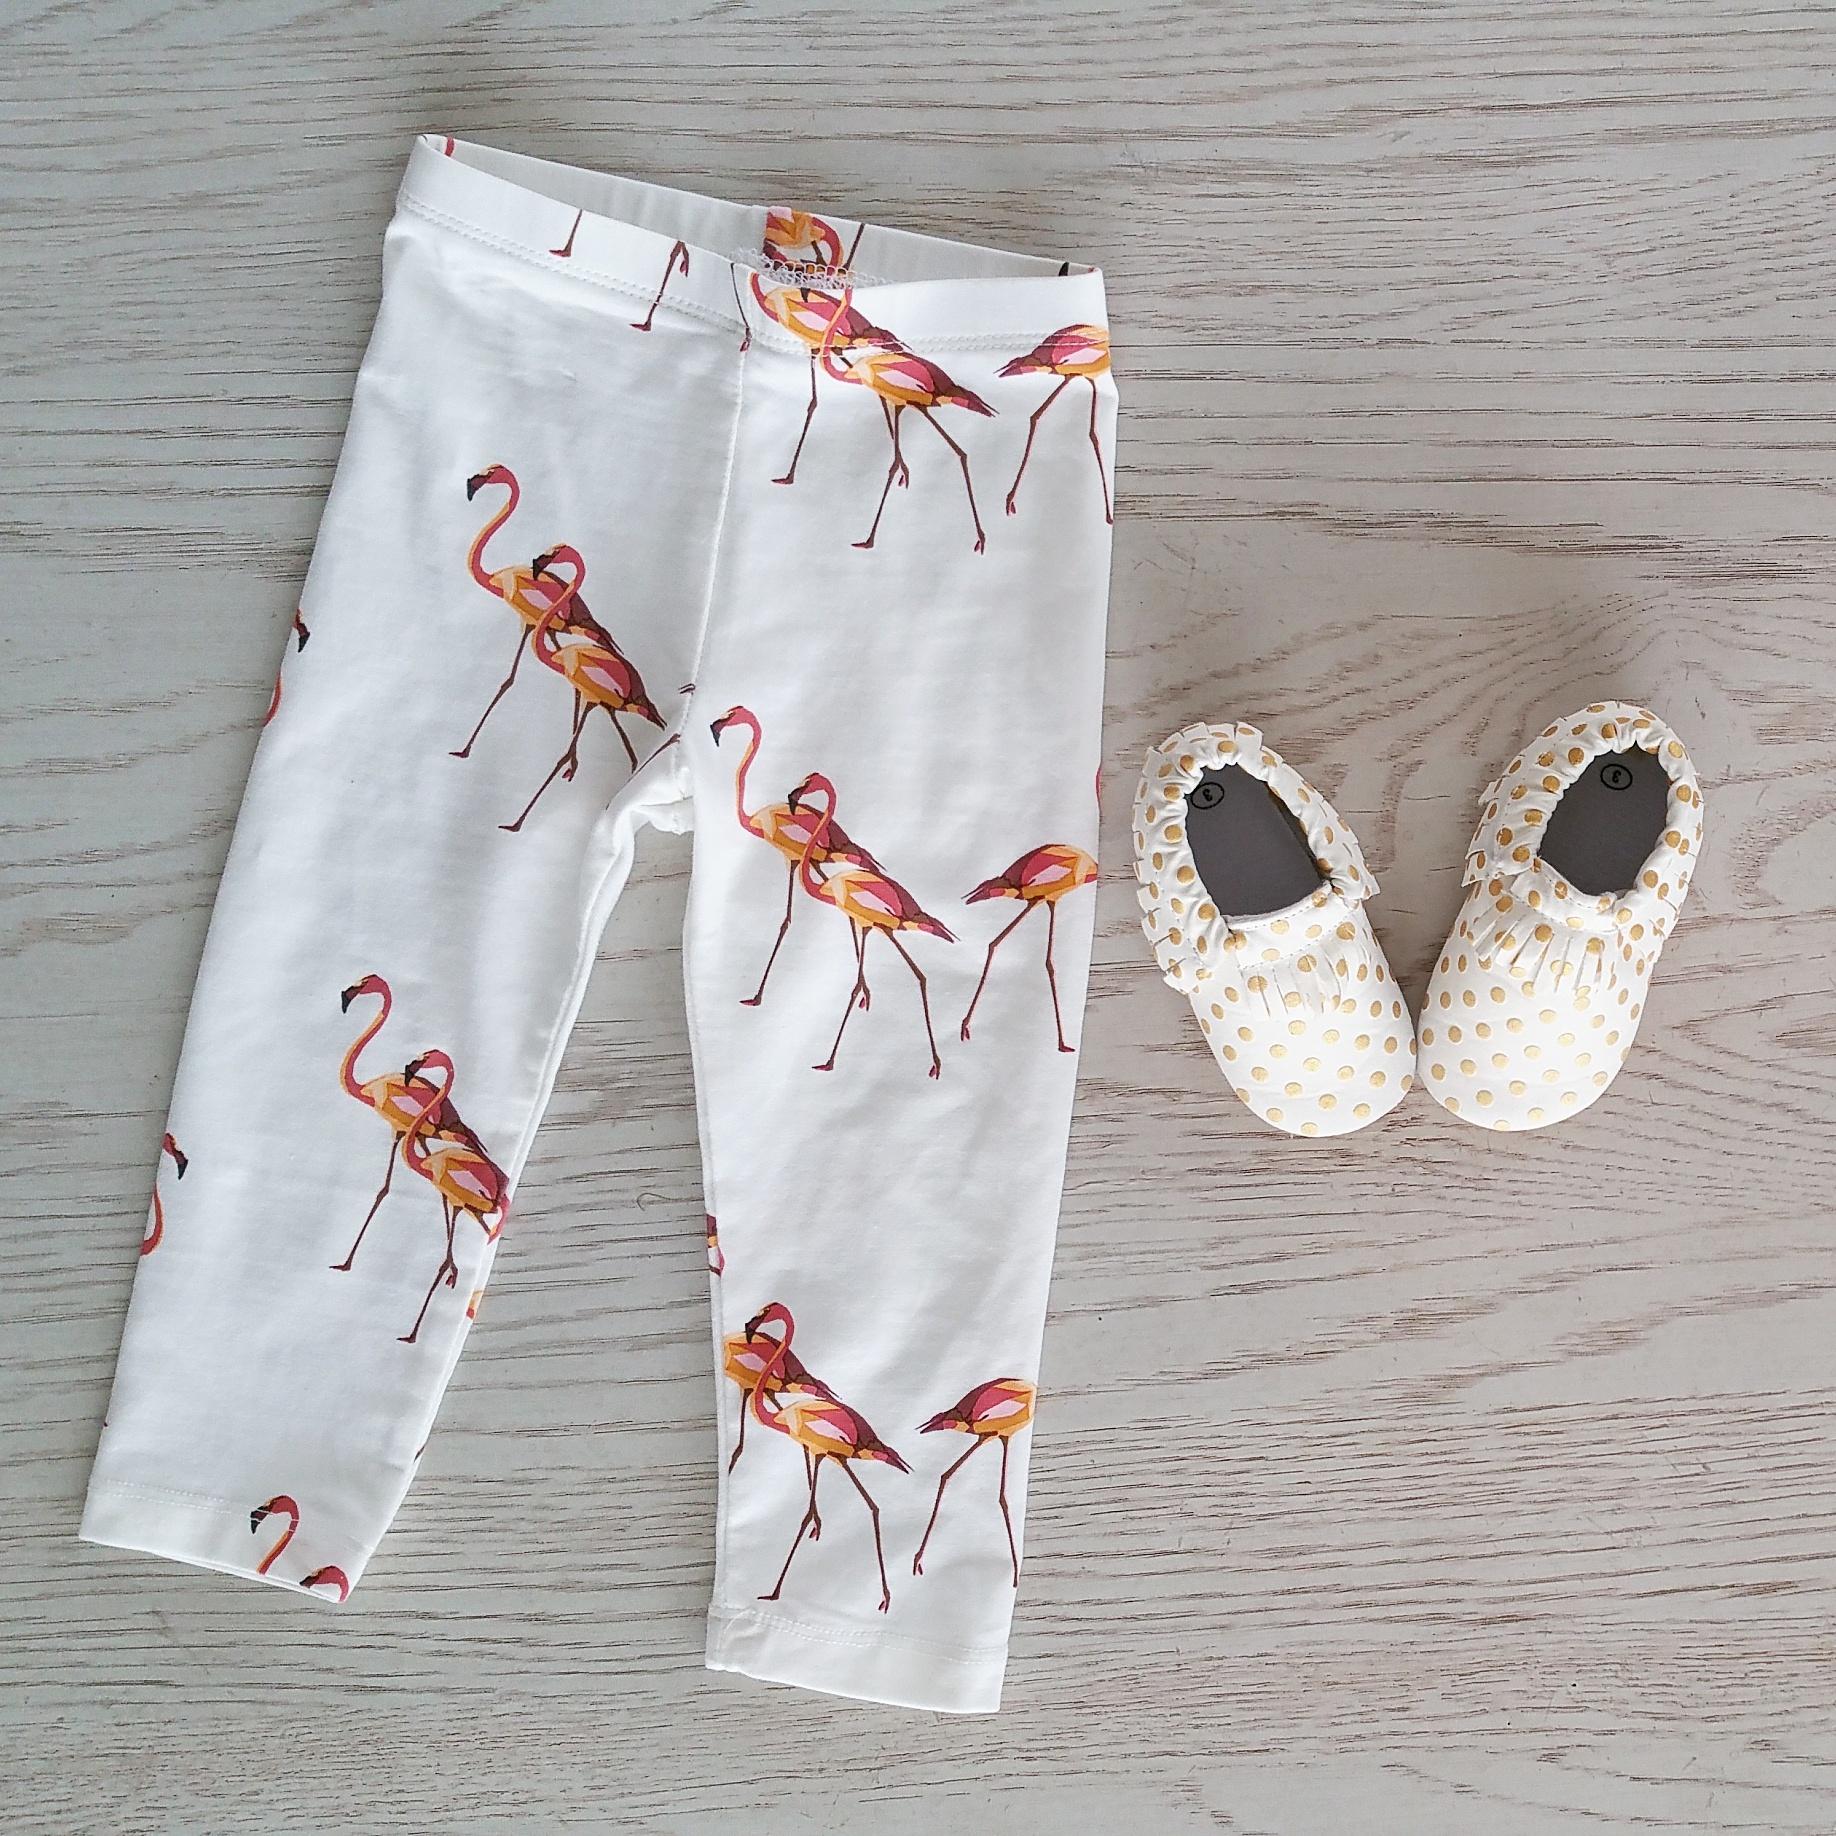 Faline and Fawn Saskatoon baby clothes